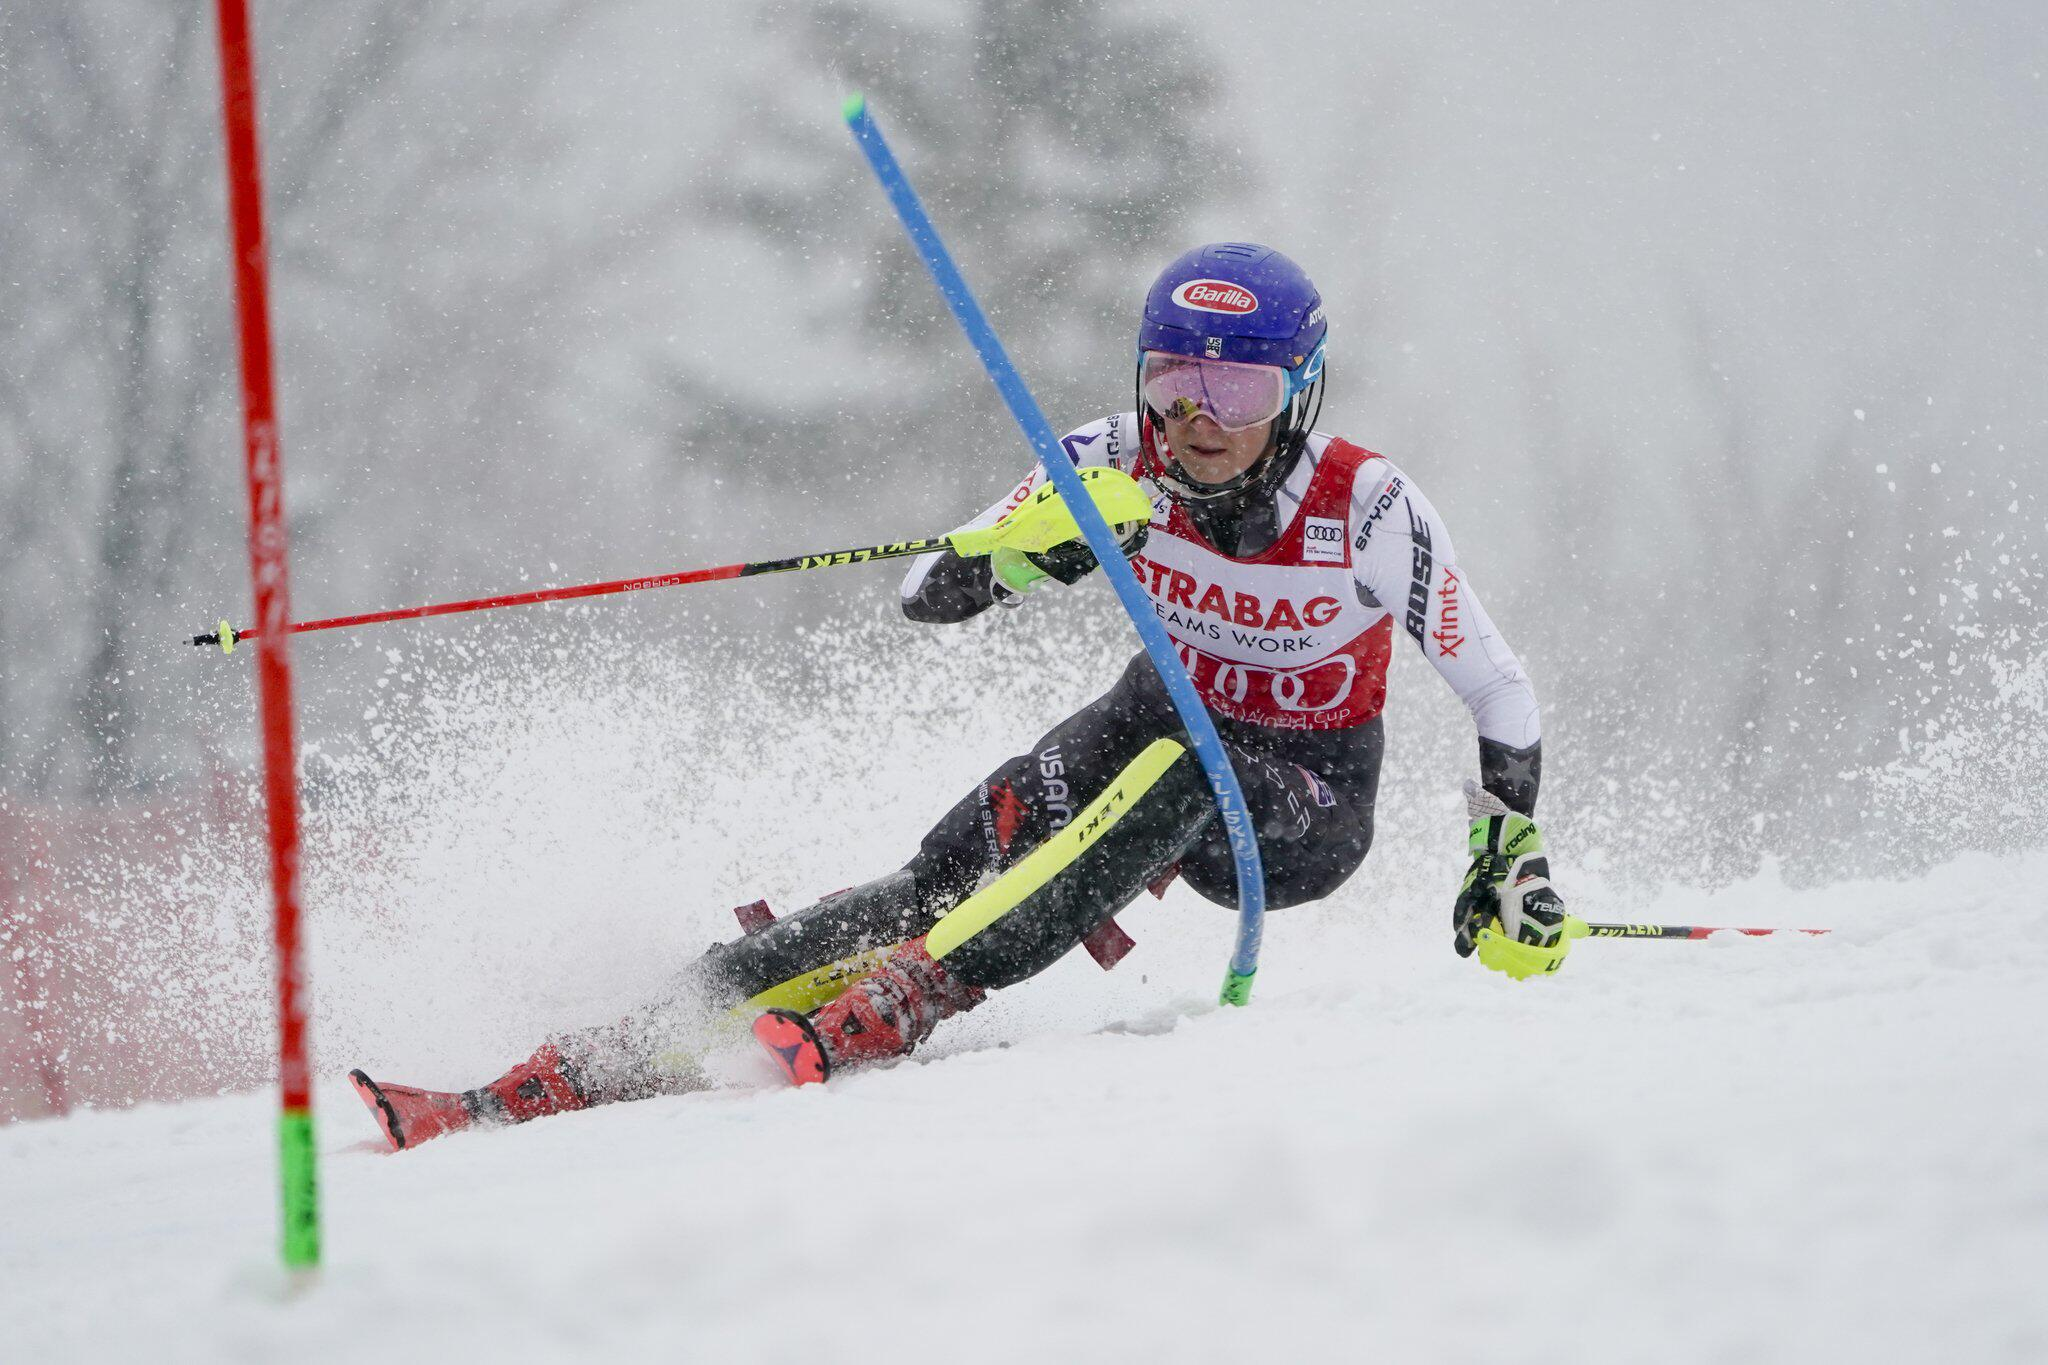 Bild zu Ski alpin, Ski, Weltcup, Mikaela Shiffrin, Spindlermühle, Slalom, Wintersport